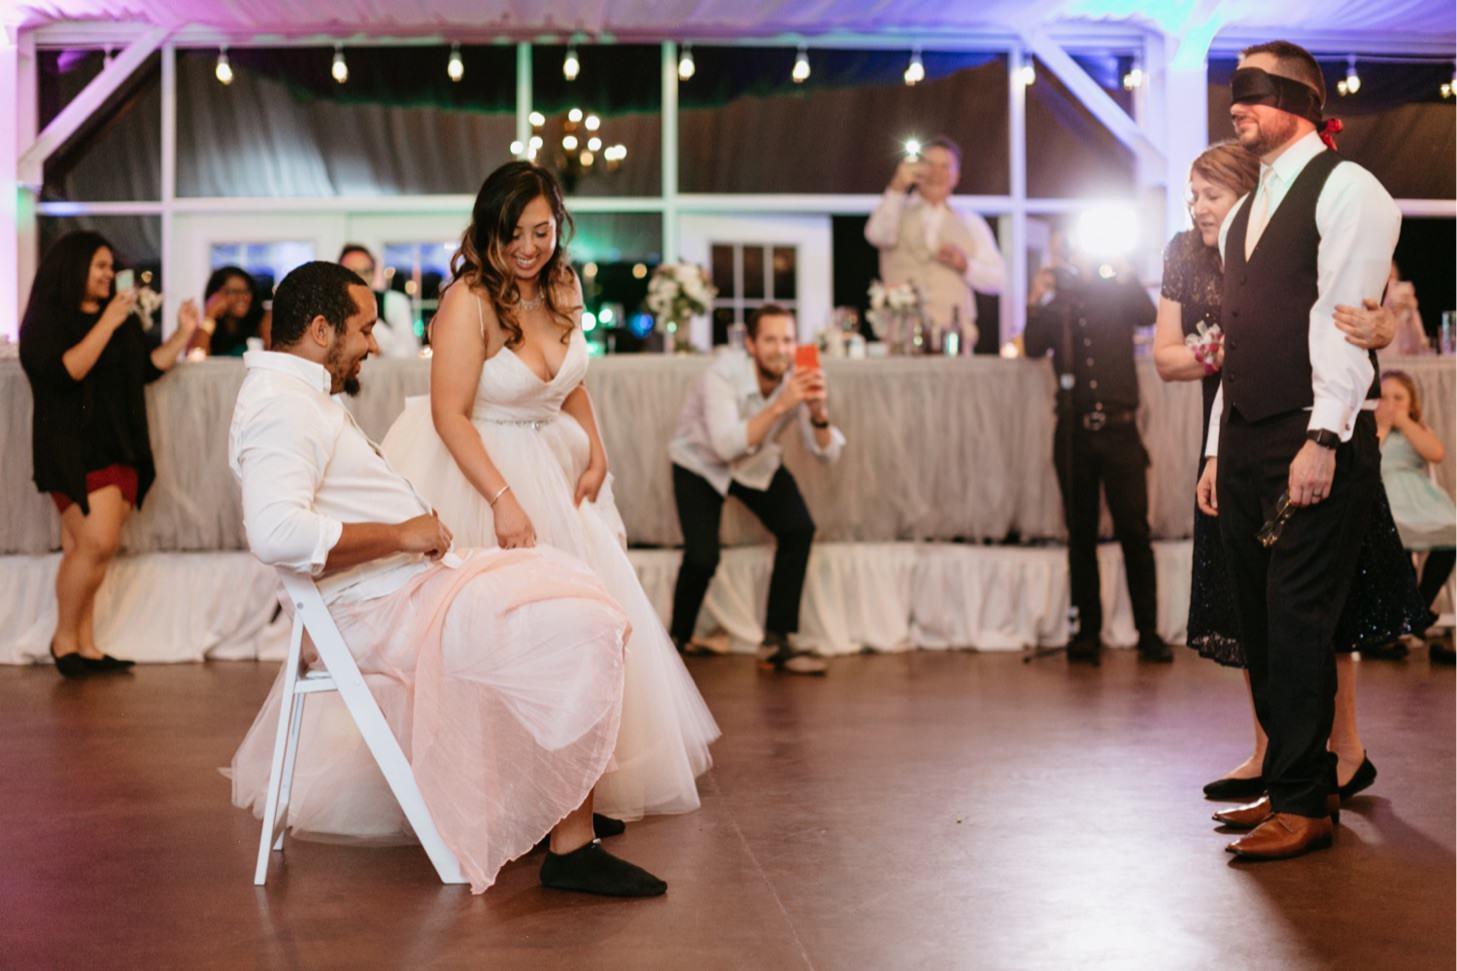 ritz-charles-wedding-reception-downtown-indianapolis-wedding-photographer074.JPG